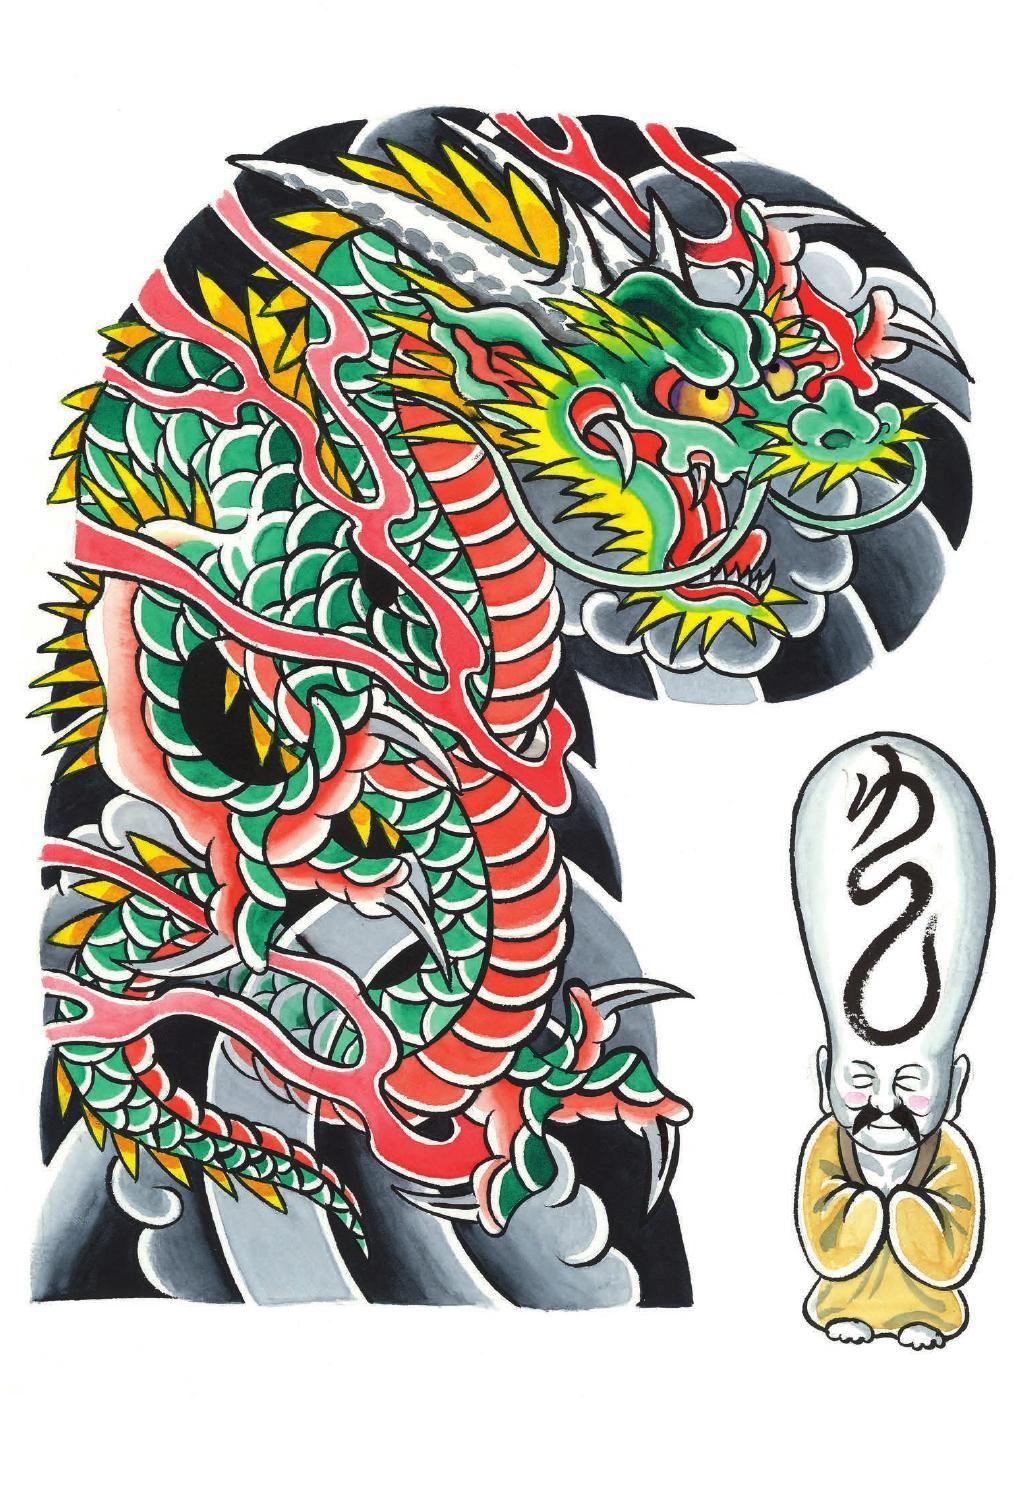 Garyou Tensei 108 Japanese Tattoo Sleeve Designs By Yushi Horikichi Takei Japanese Sleeve Tattoos Japanese Tattoo Japanese Dragon Tattoos